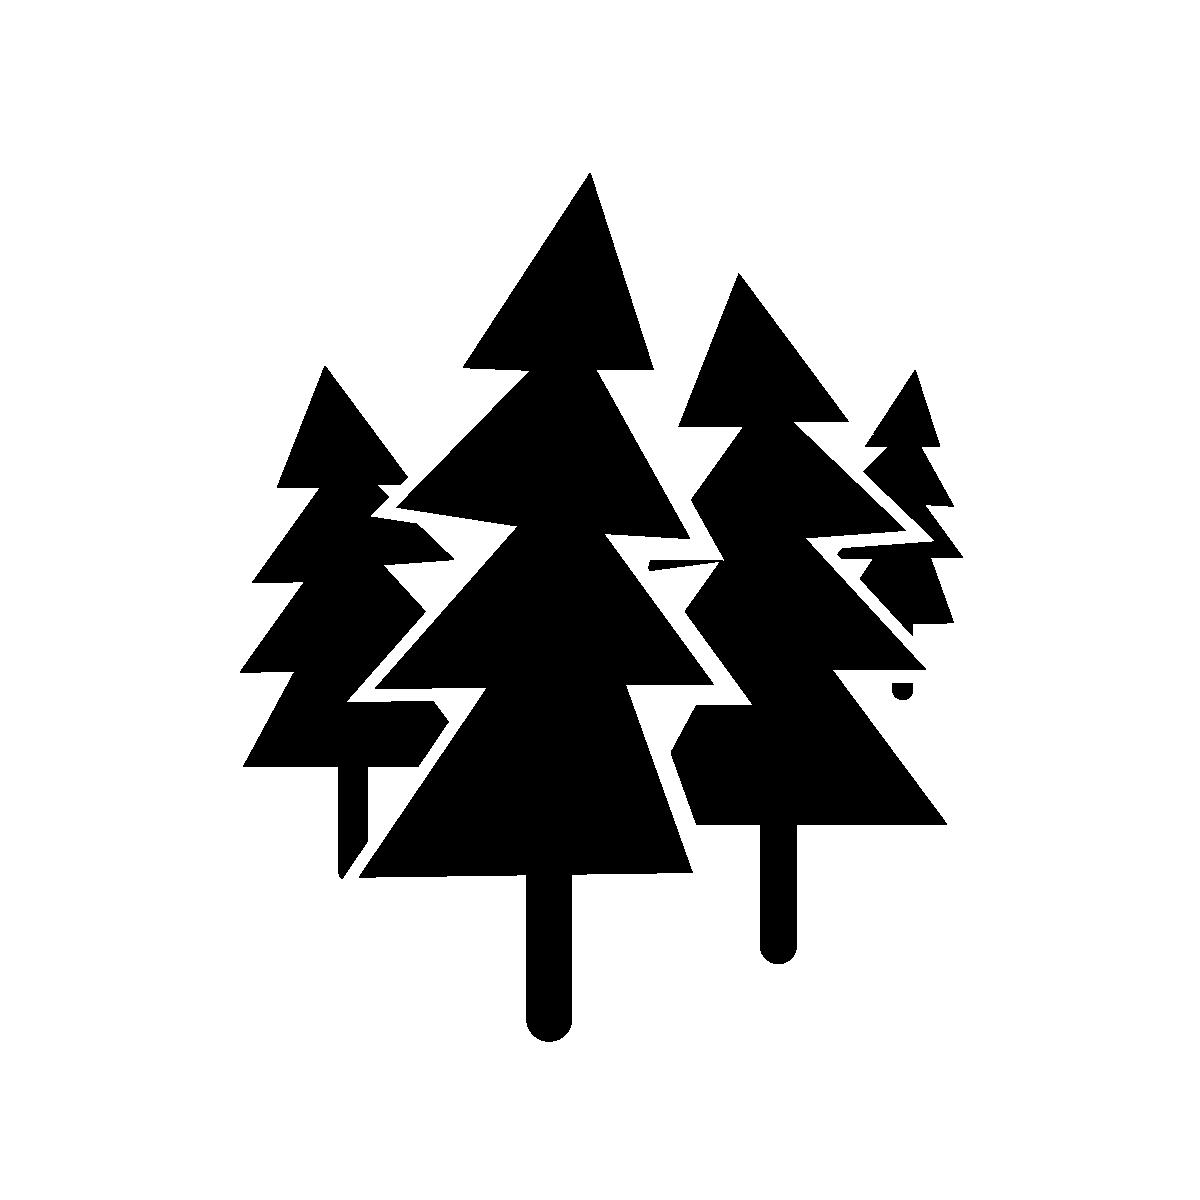 cc-logo_15.png